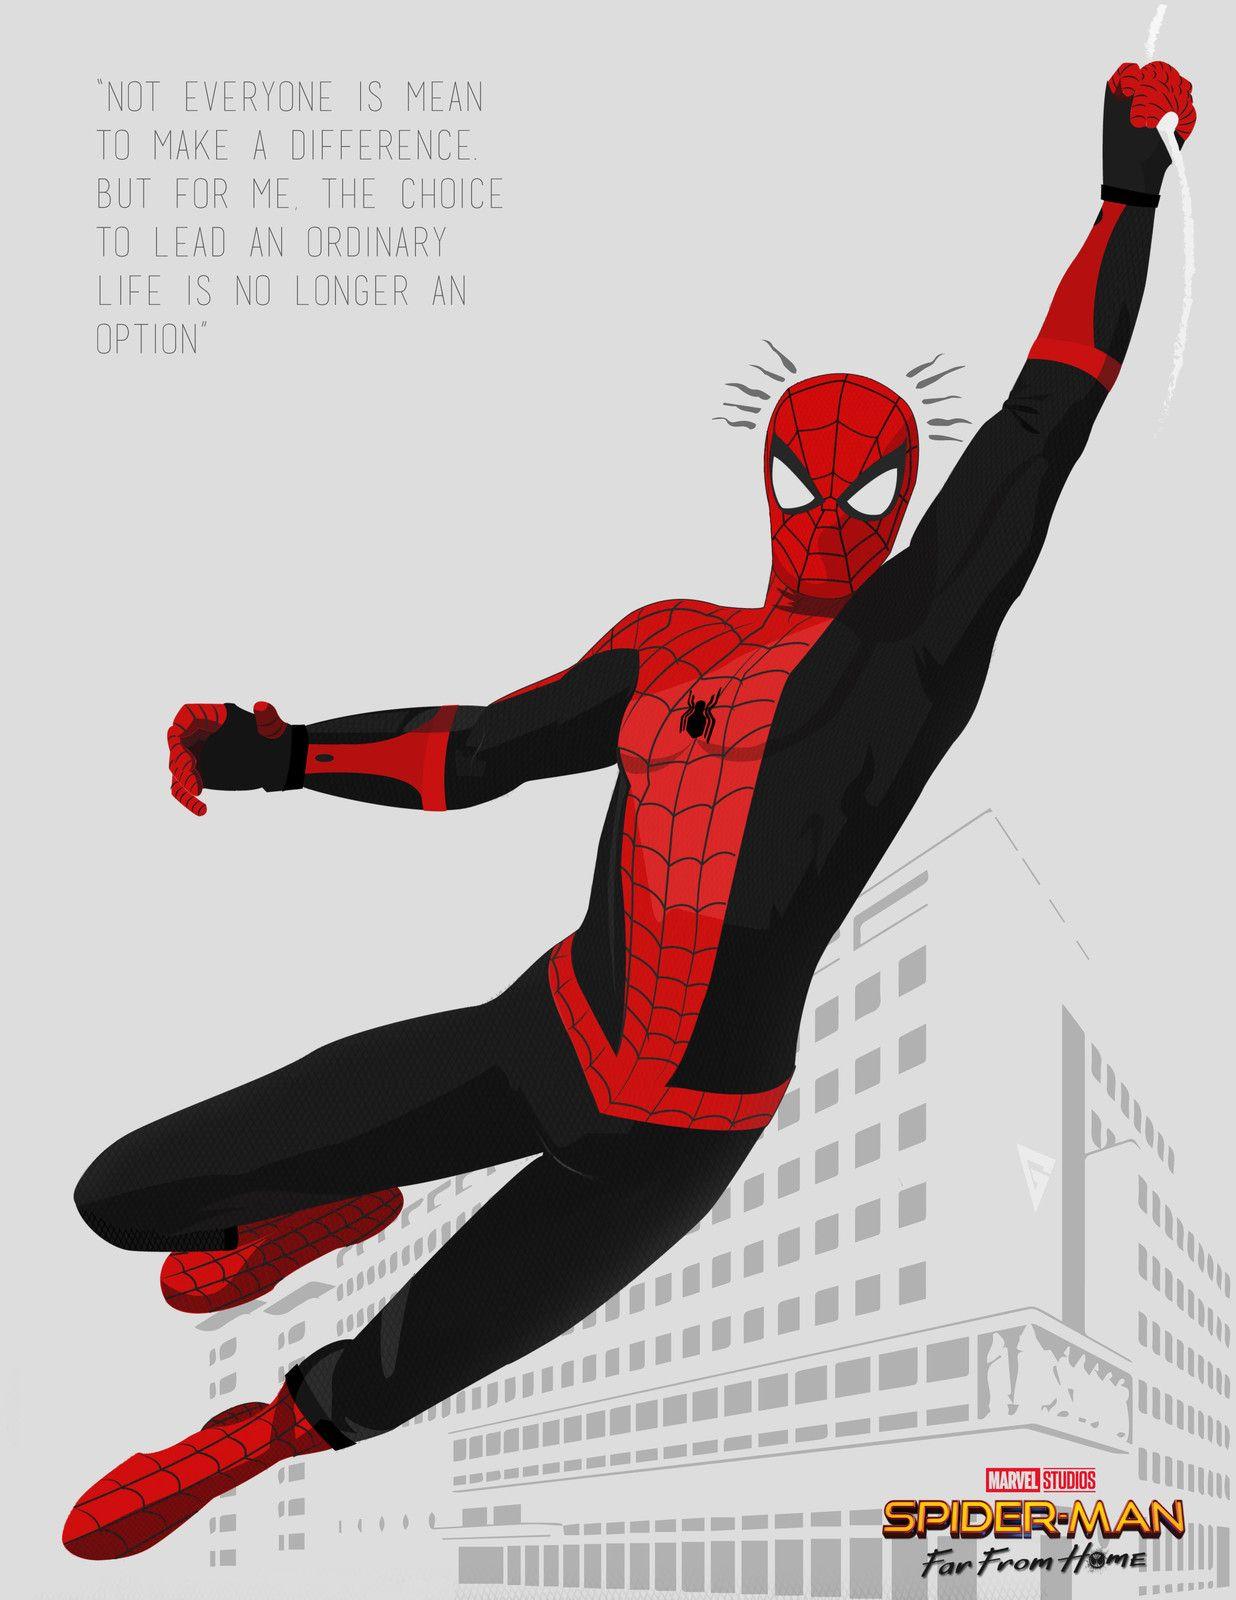 Spiderman Far From Home Absolute Graphix On Artstation At Https Www Artstation Com Artwork A99qbq Spiderman Spiderman Comic Spiderman Drawing